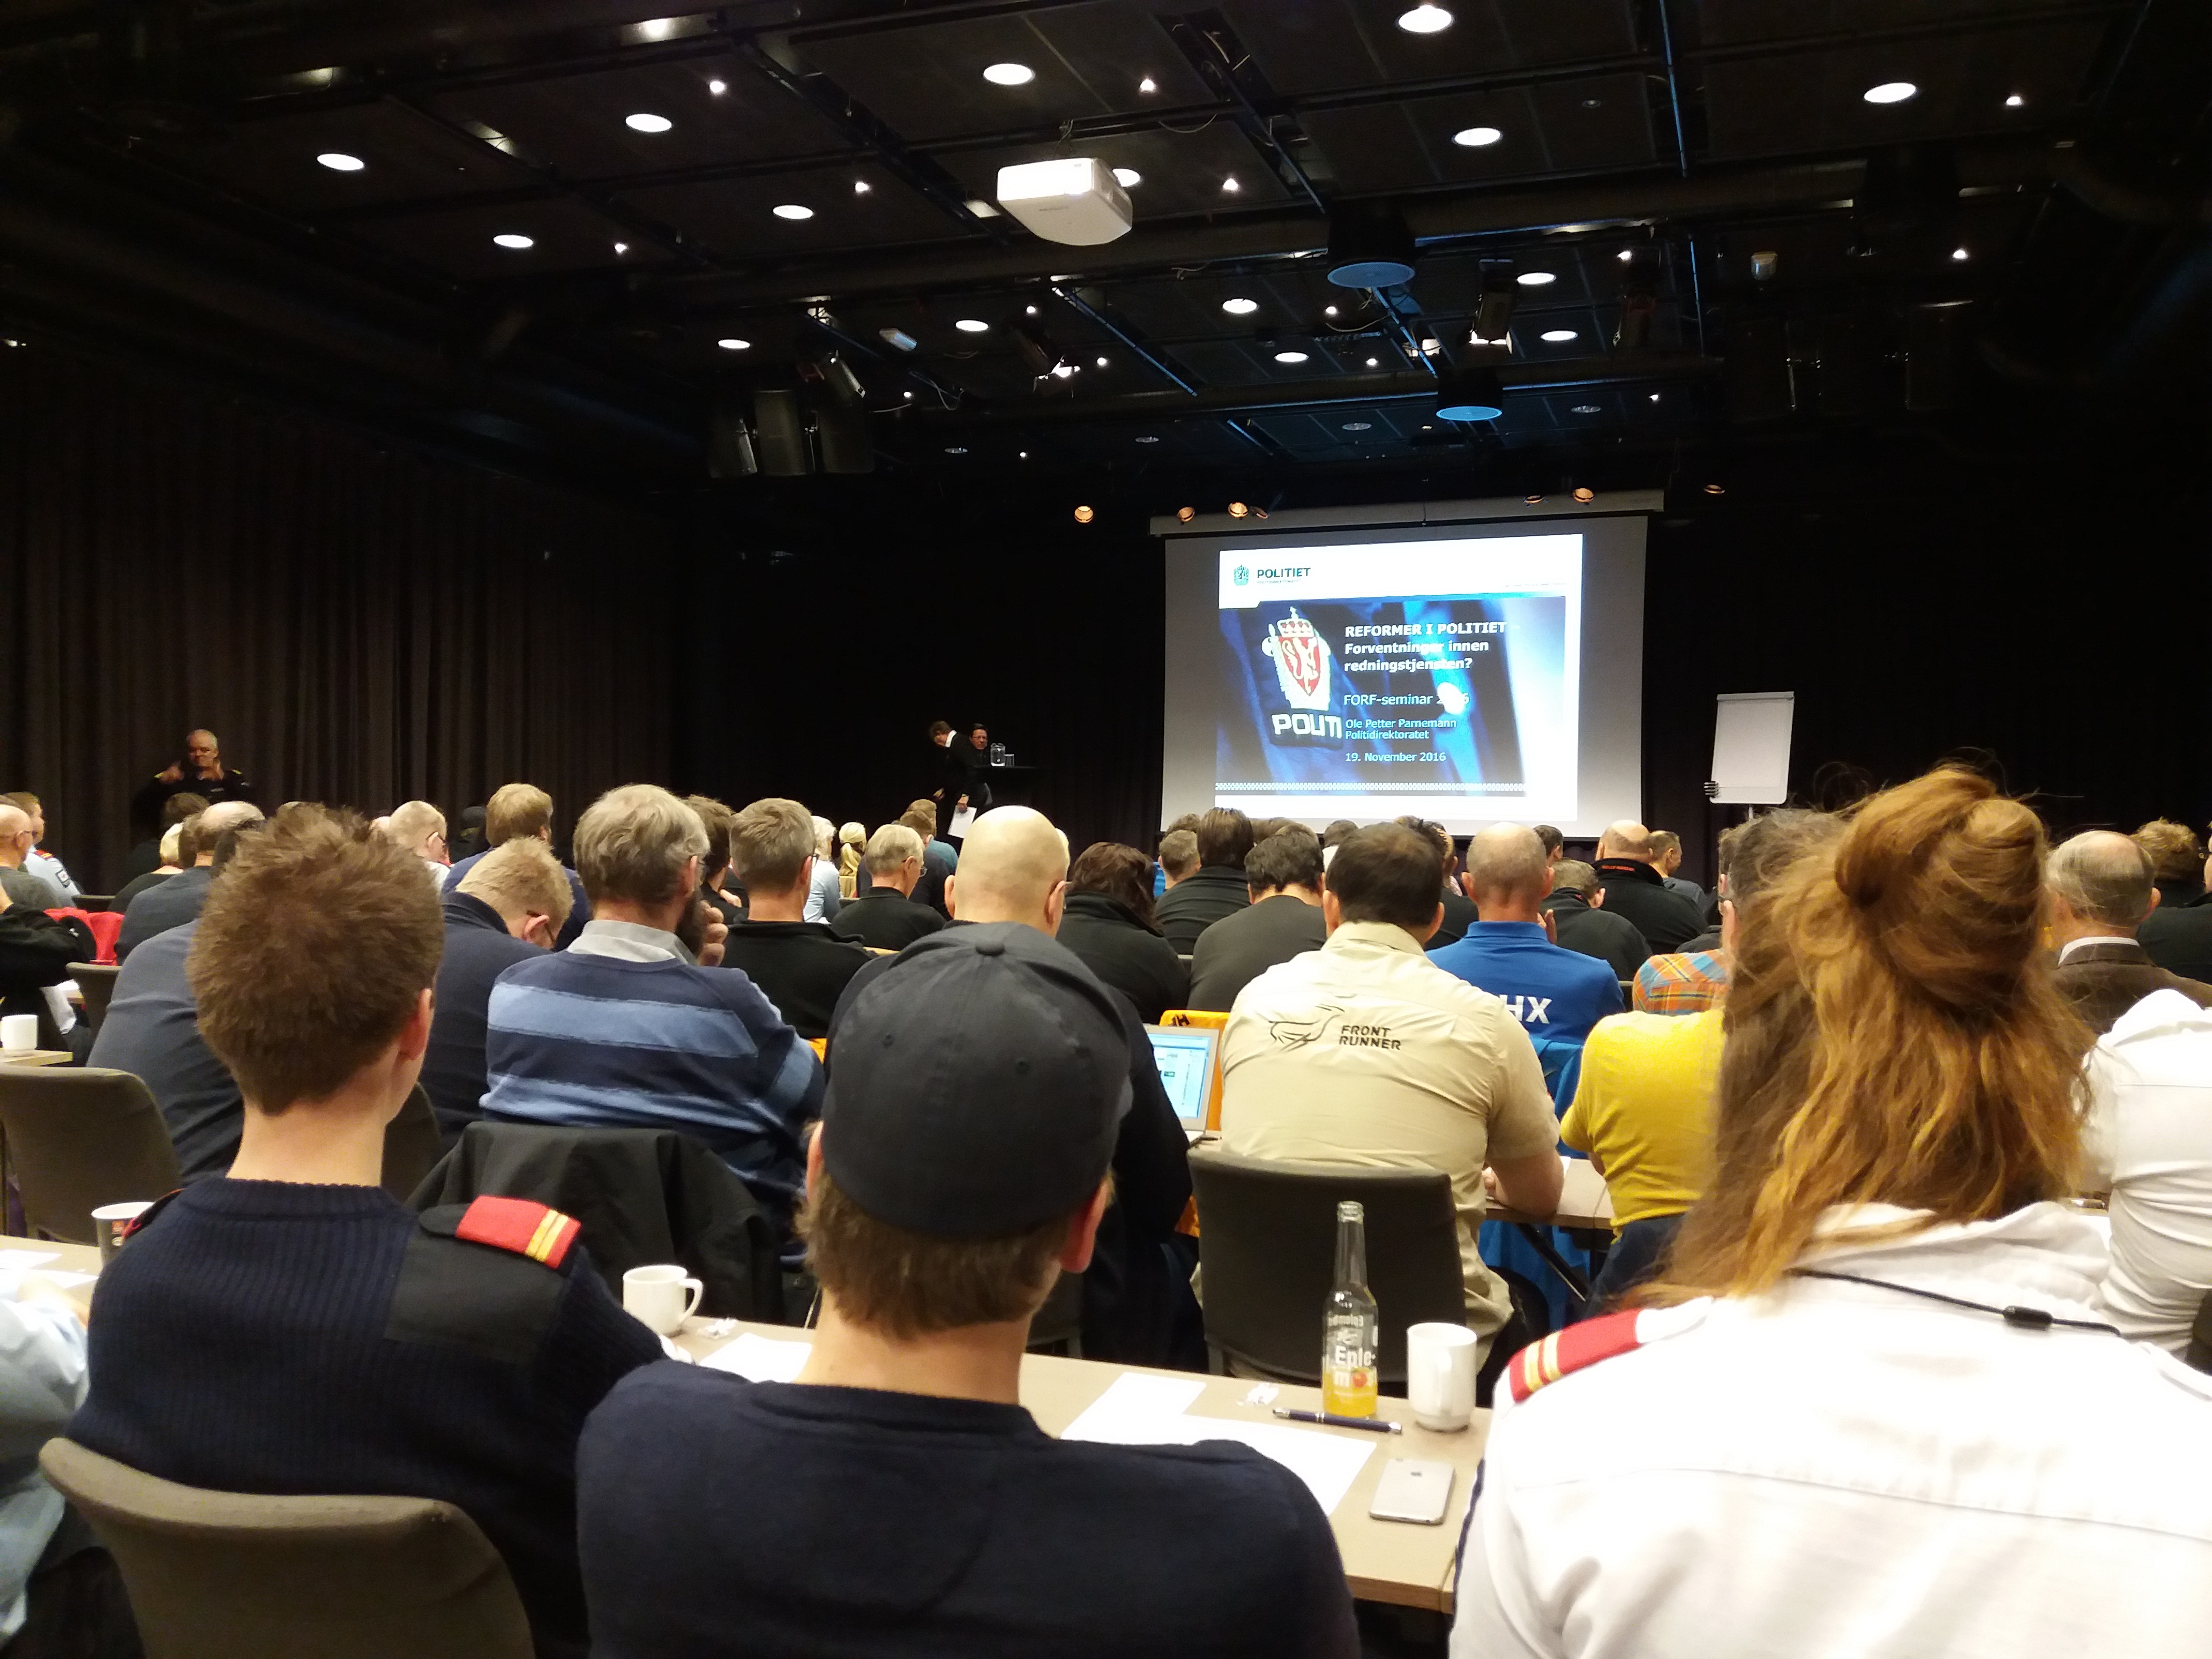 FORF-seminar avholdt på Gardermoen